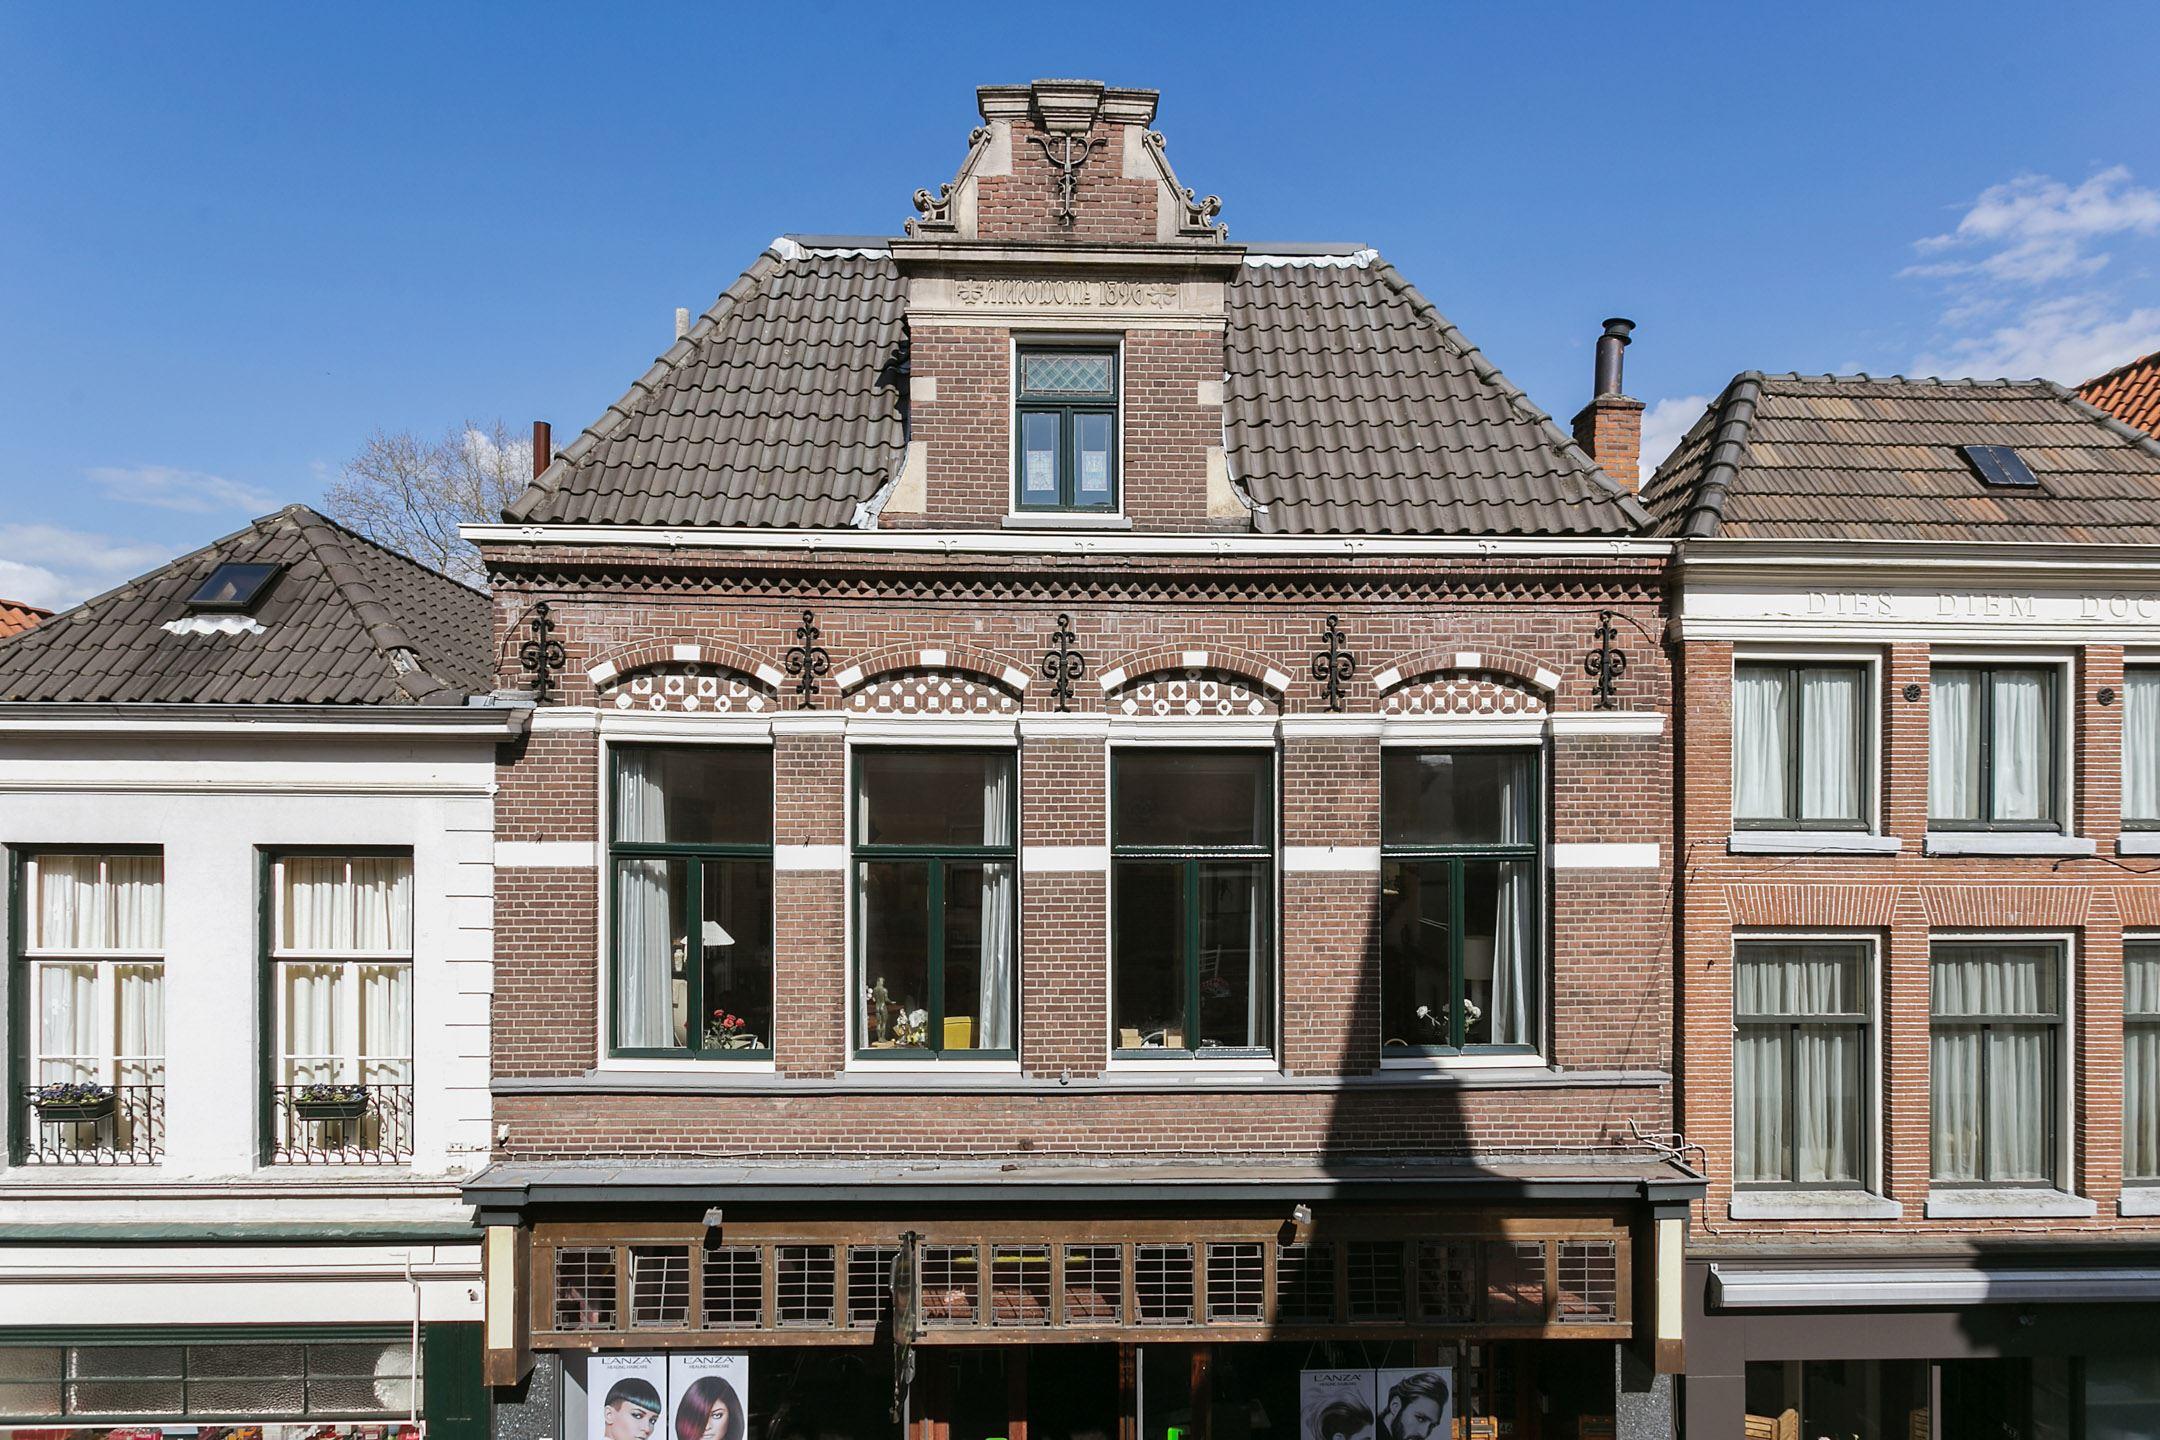 Wolters Badkamers Deventer : Verkocht: nieuwstraat 46 7411 lm deventer [funda]